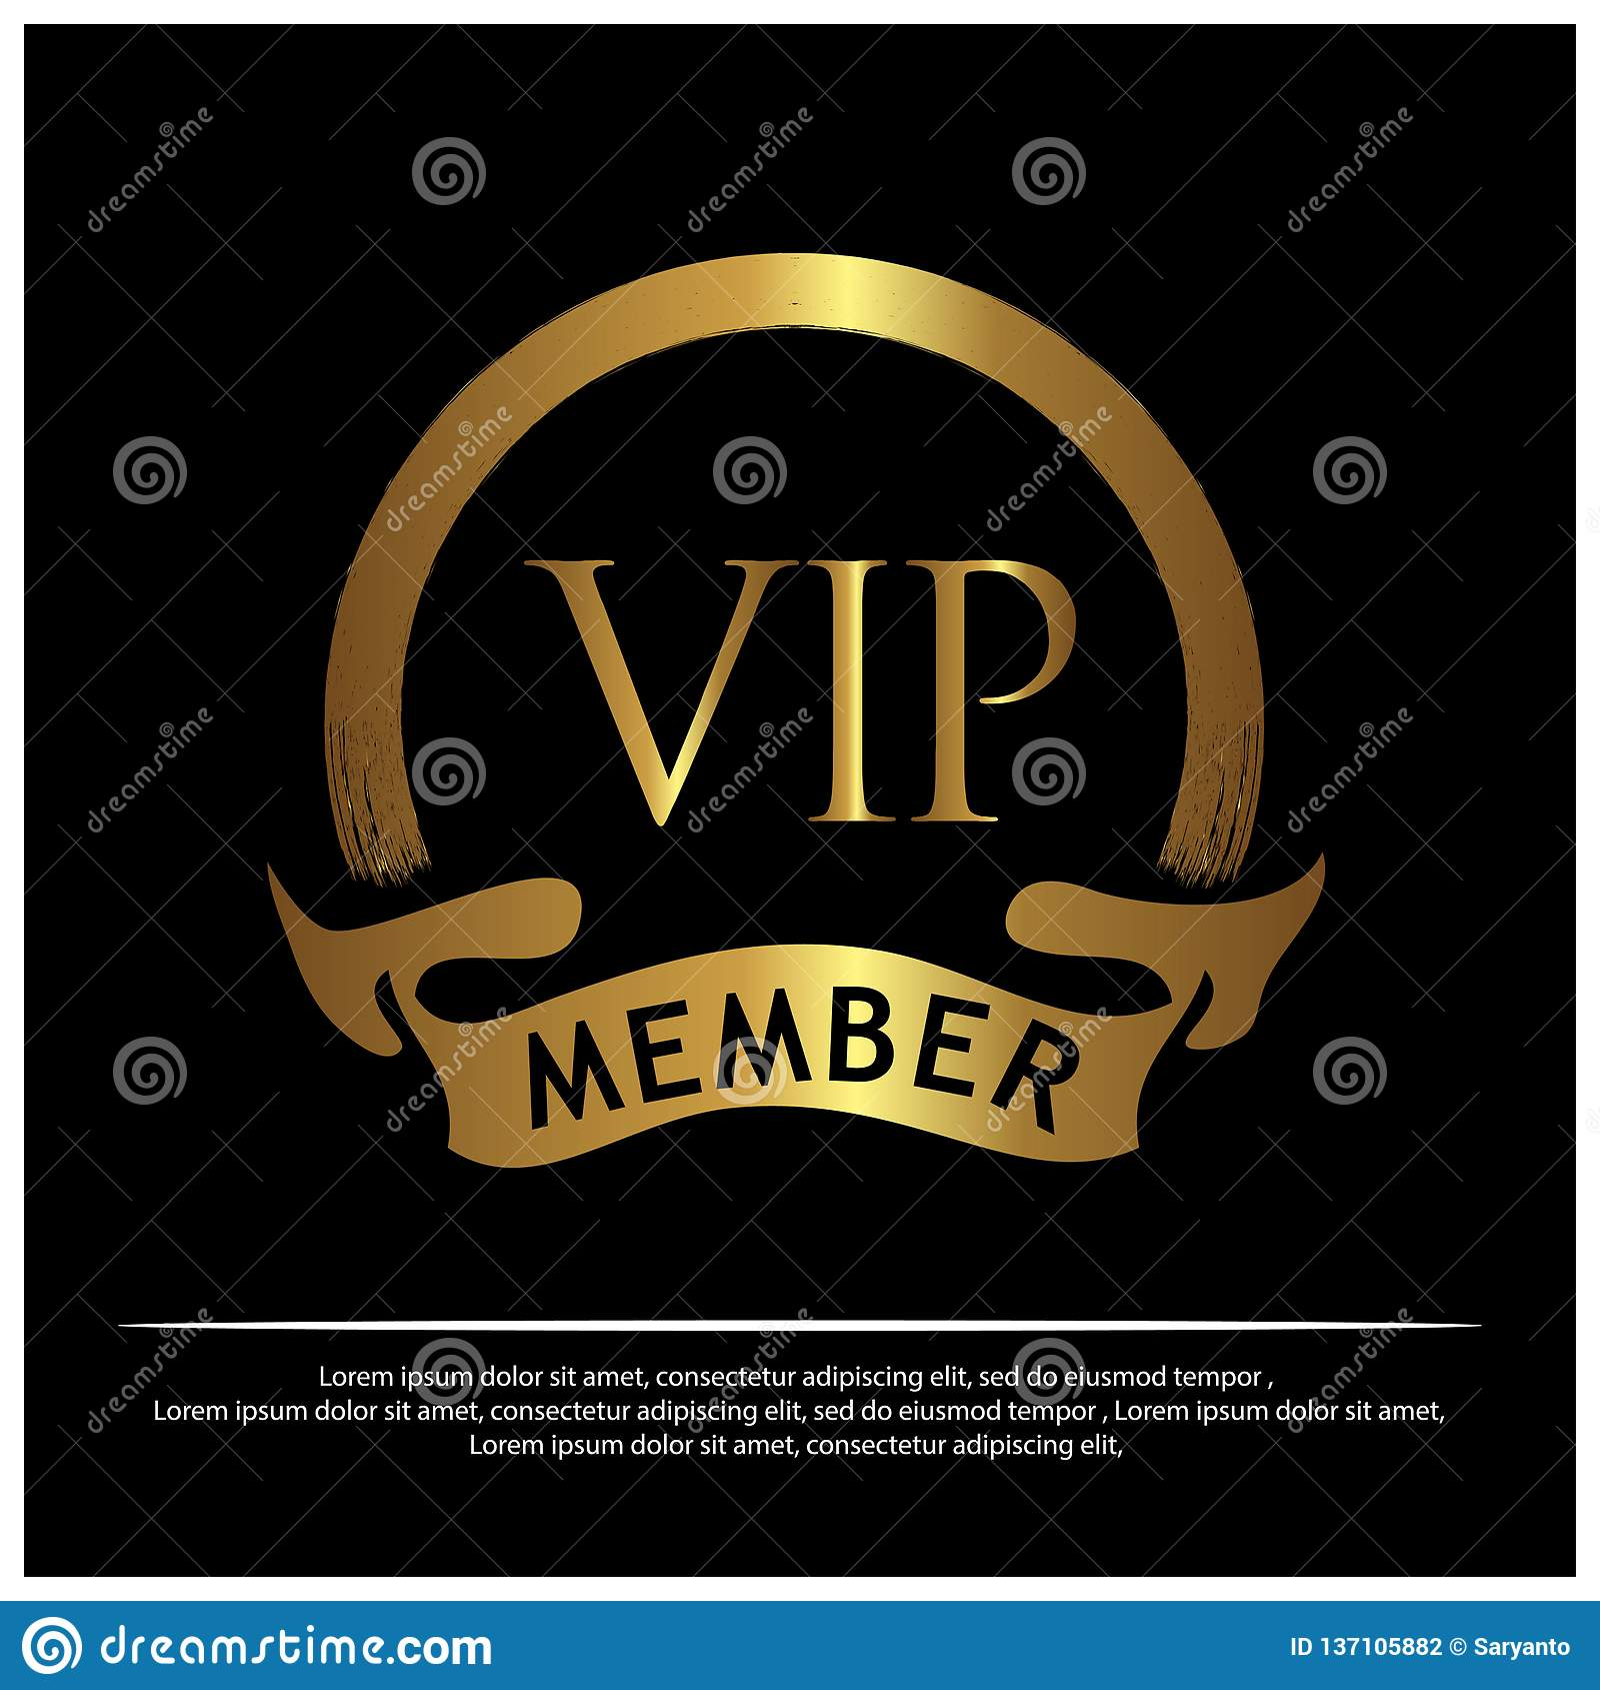 VIP成员股票象 商标的,横幅,模板,传染媒介以图例解释者-传染媒介设计